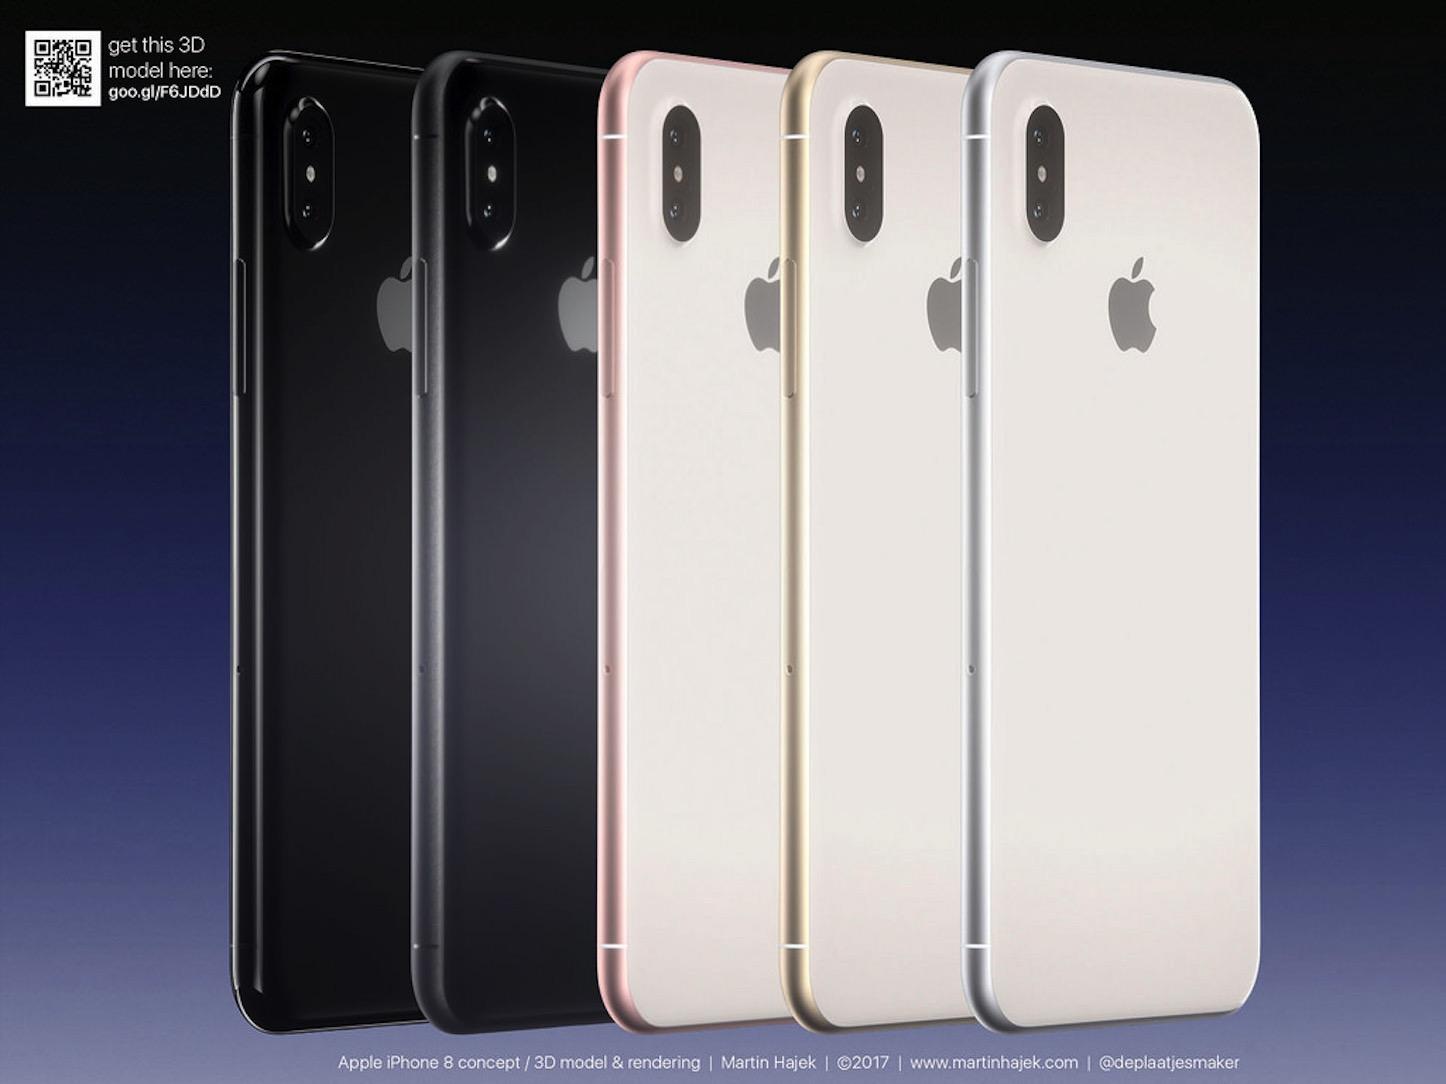 iPhone-Pro-8-Martin-Hajek-Reders-5.jpg